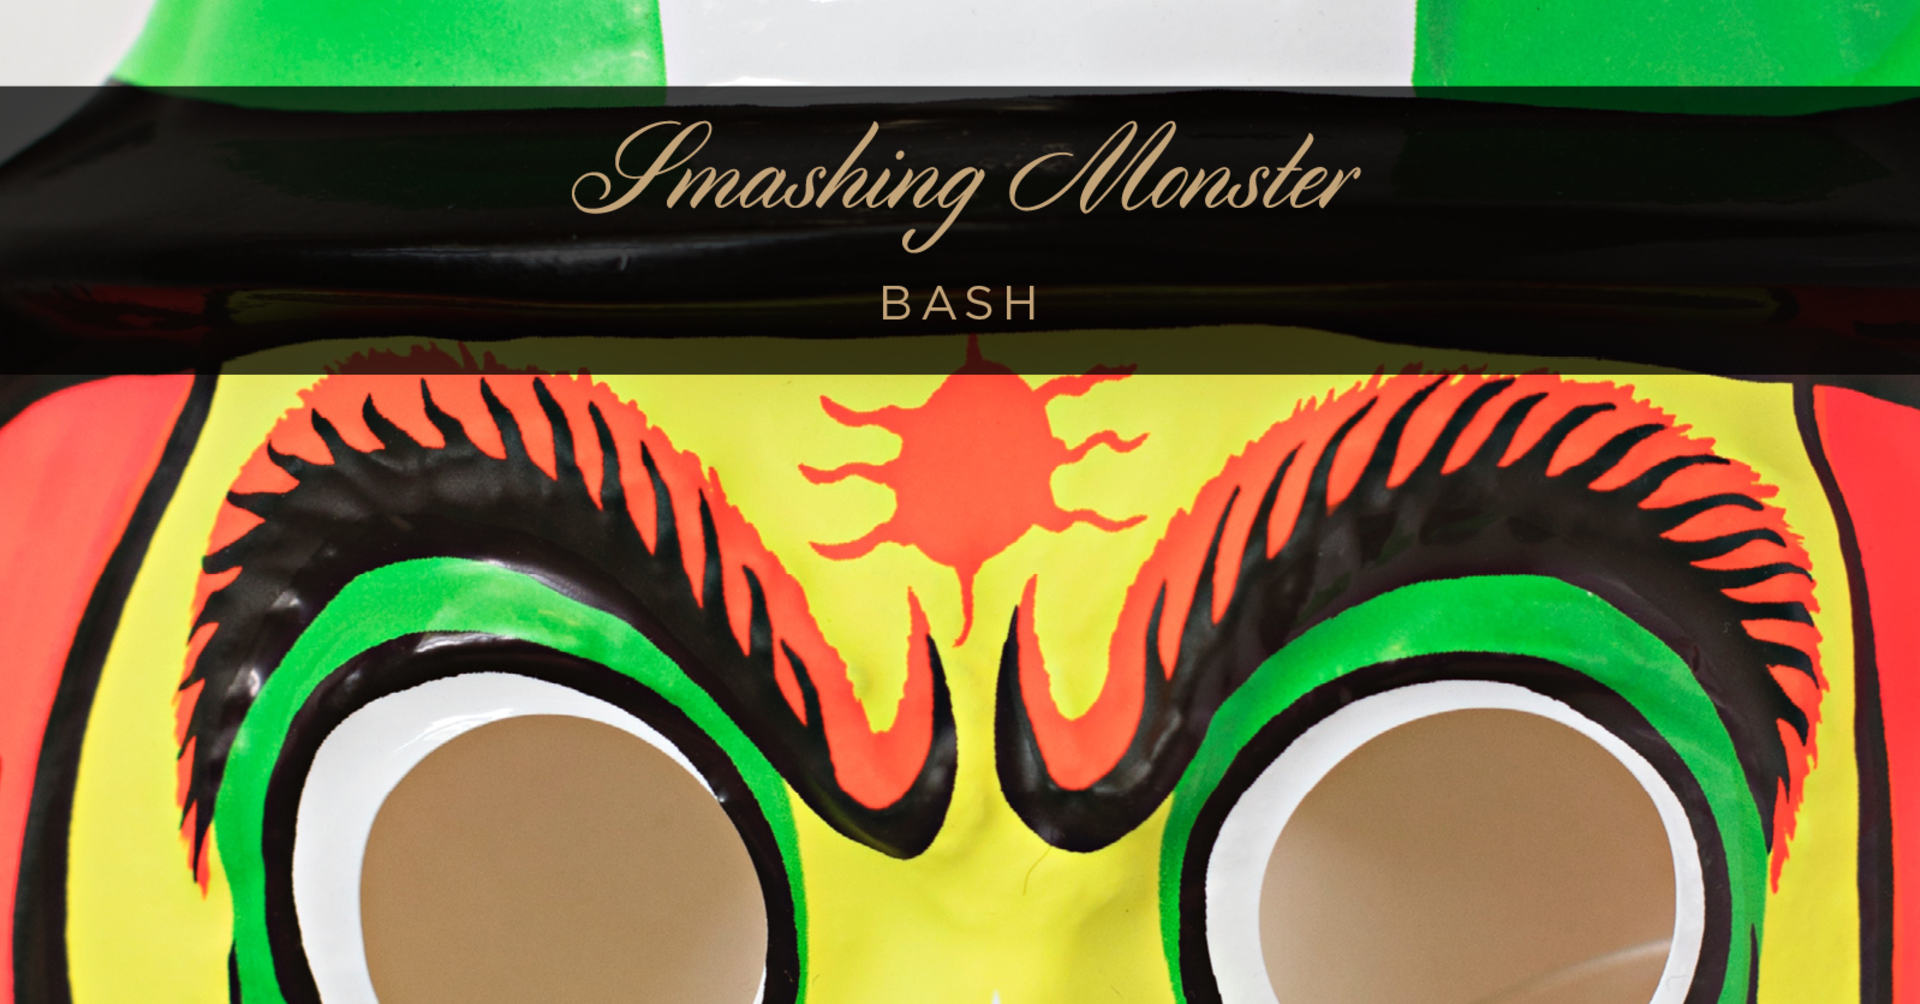 Smashing Monster Bash